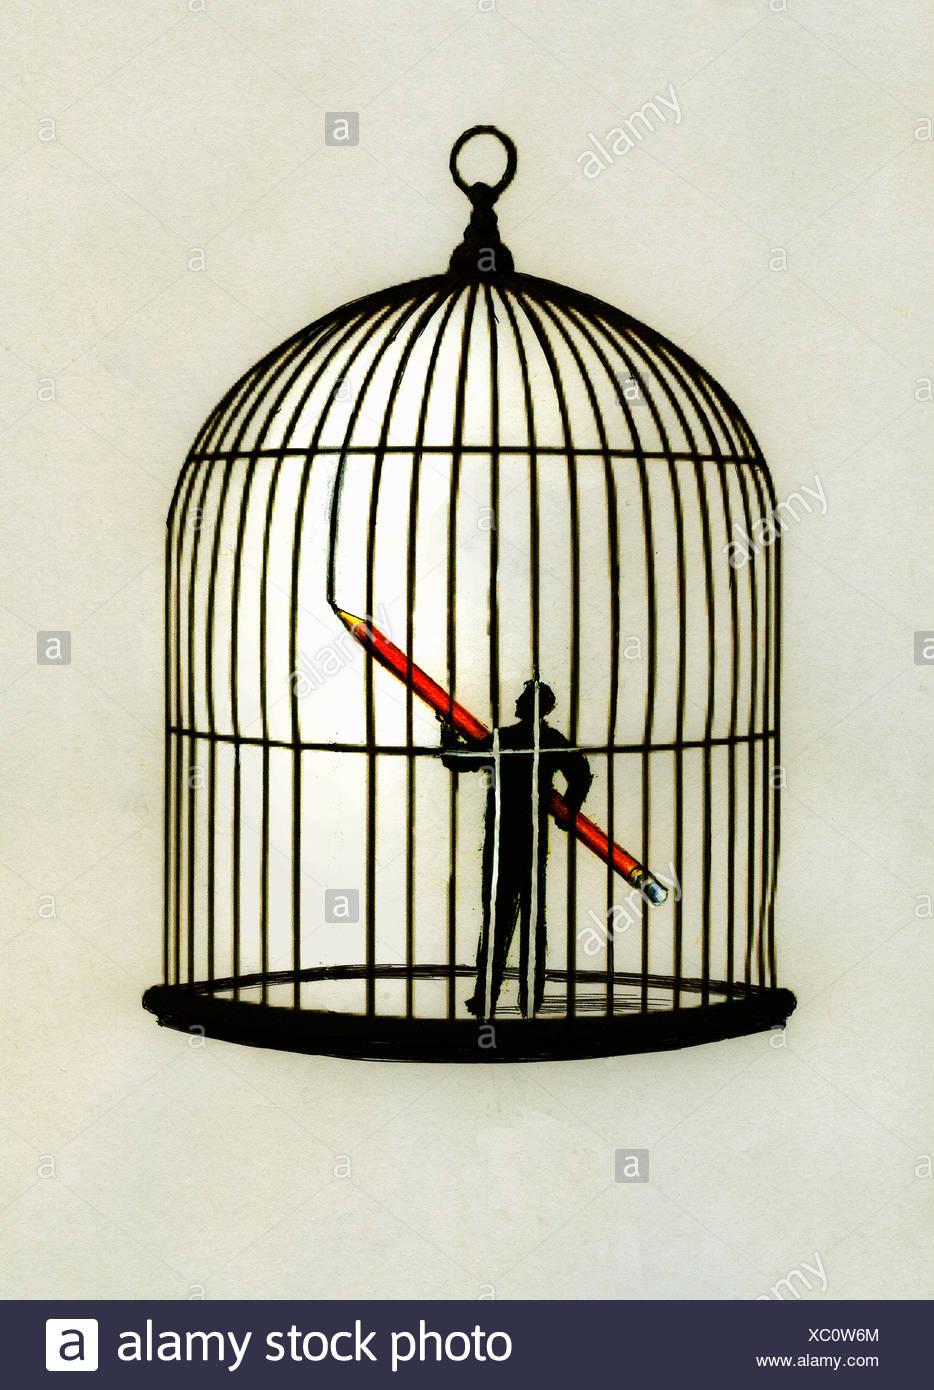 Man inside of birdcage - Stock Image